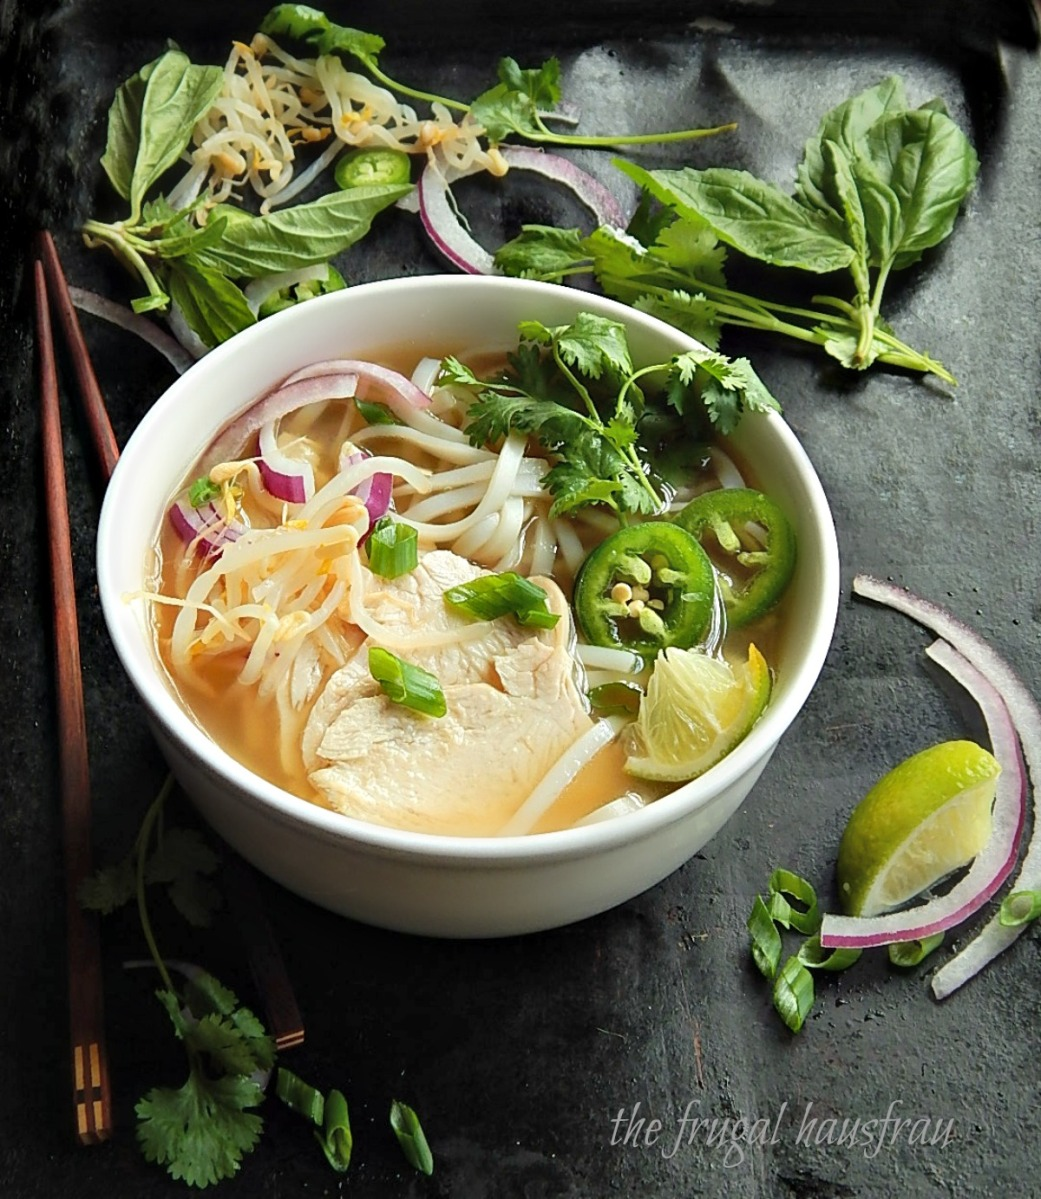 Shortcut Pho Ga (Vietnamese Chicken Noodle Soup) or Pho Ga Tay Instant Pot or Stove-top